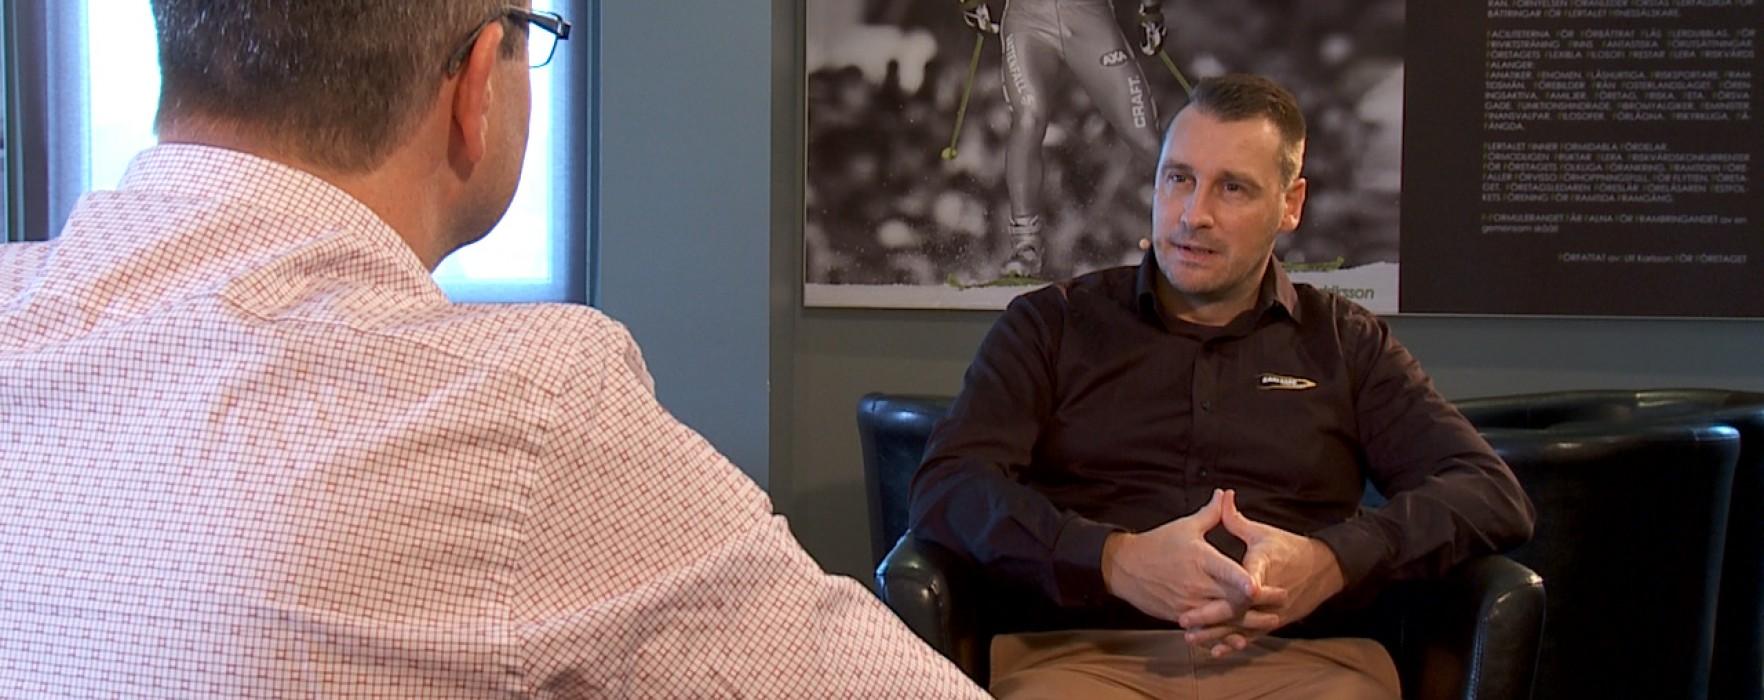 Glimt Sport – Niklas Hovivuori, Karlstad IBF